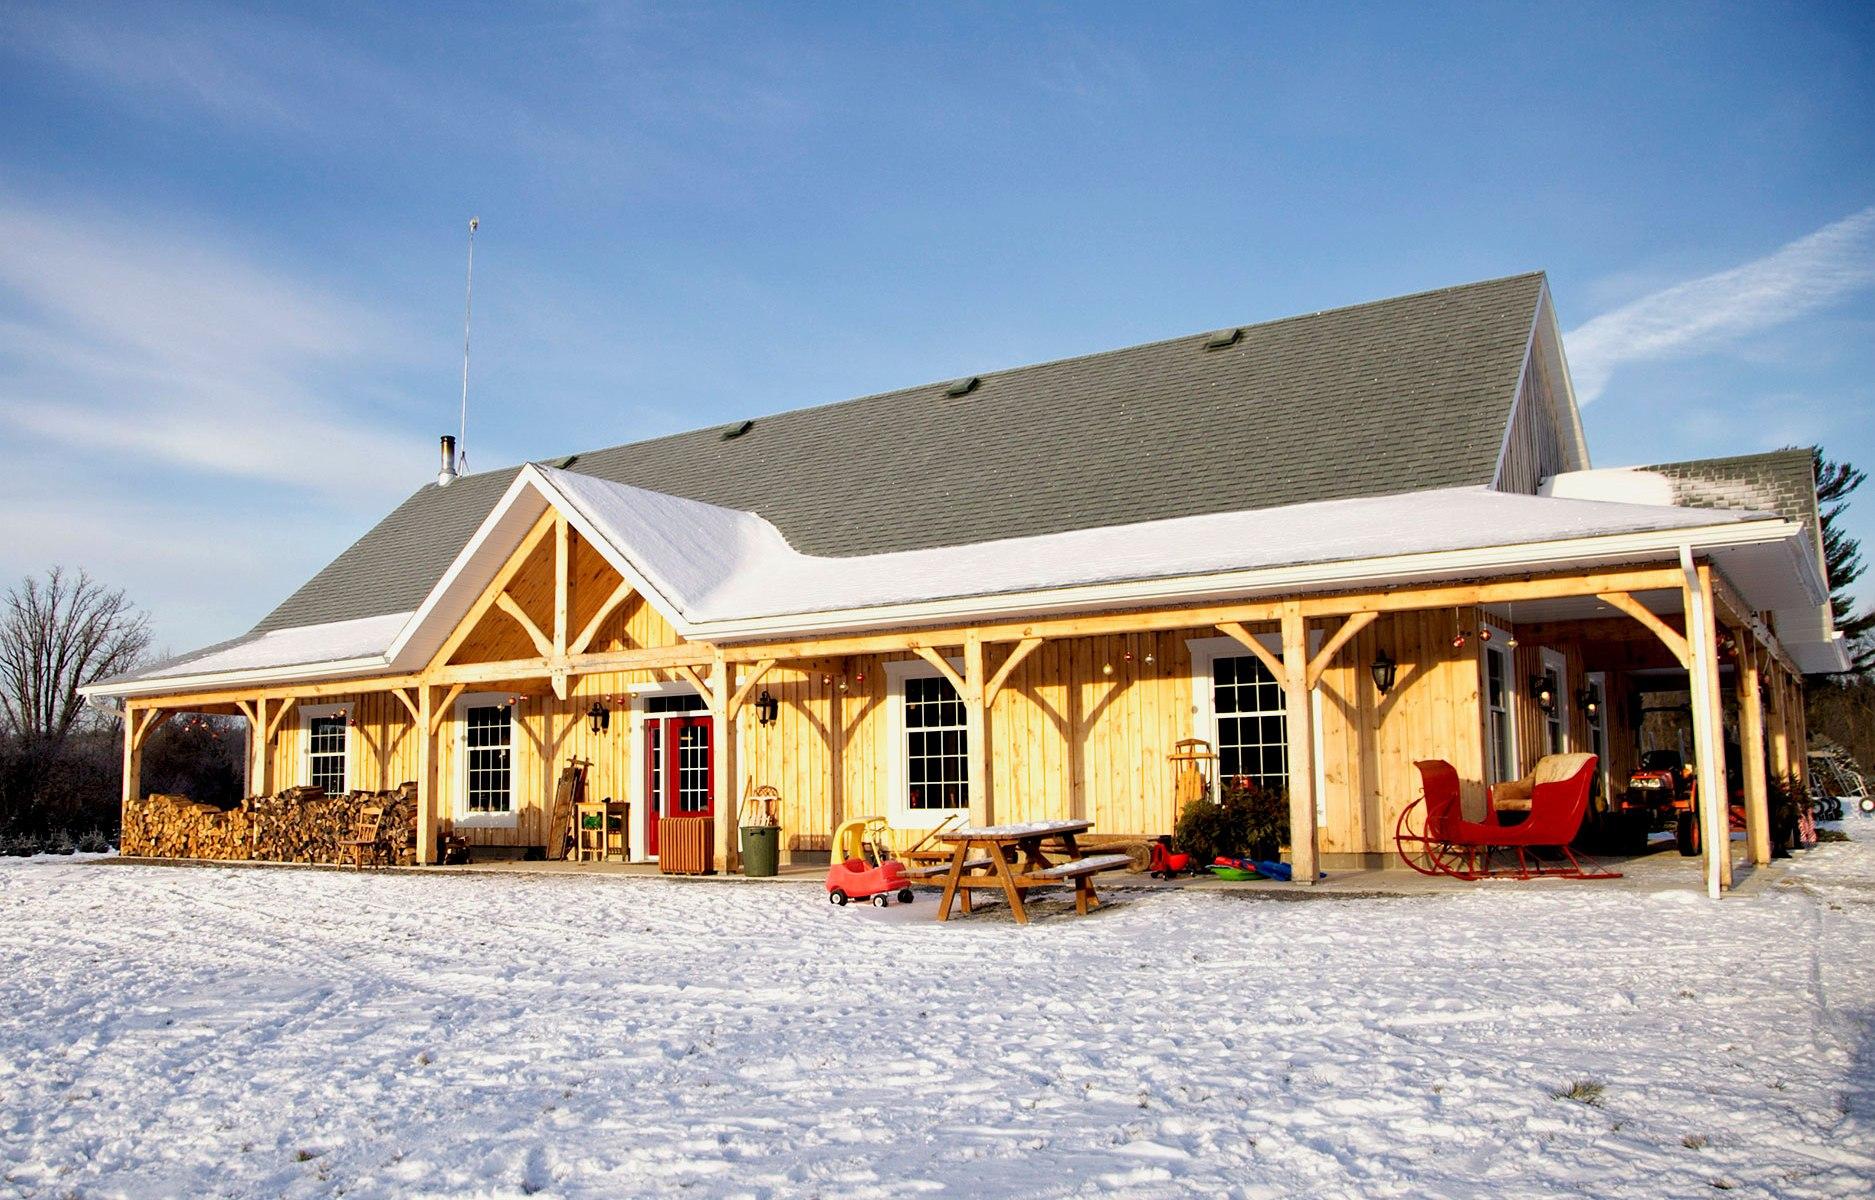 Contact Ottawa Christmas Tree Farm in Pakenham